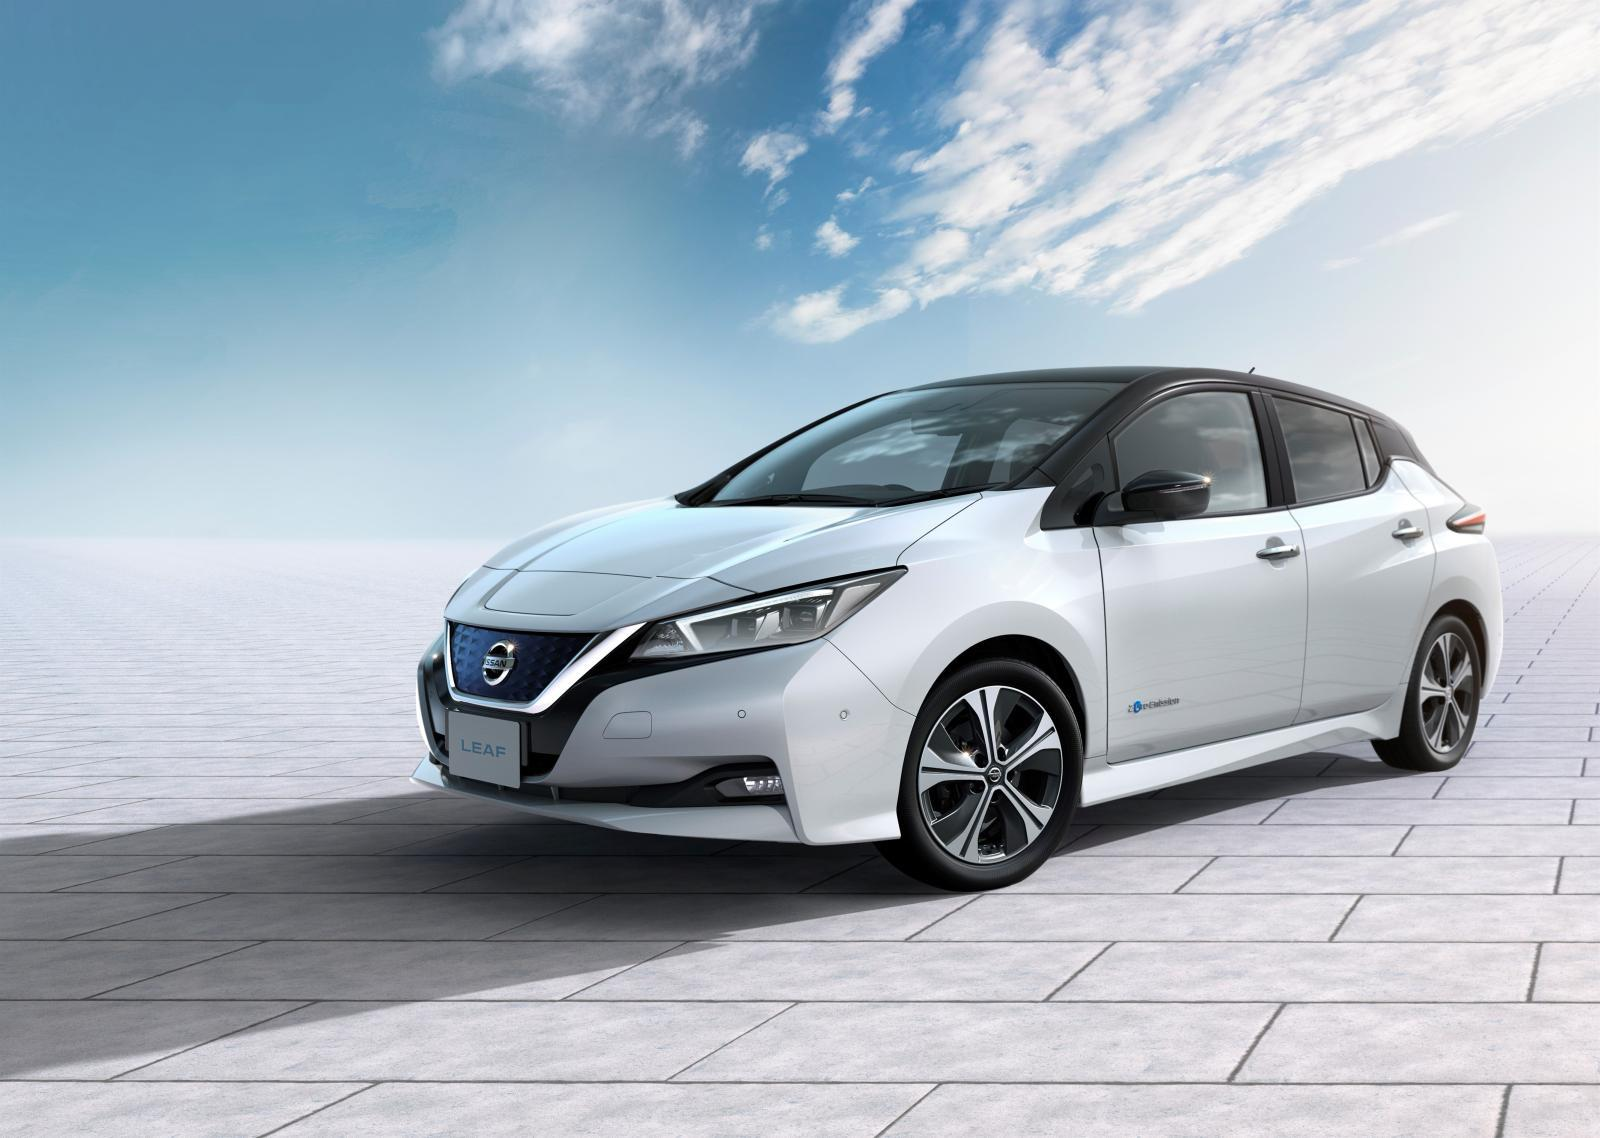 2018-Nissan-leaf-2